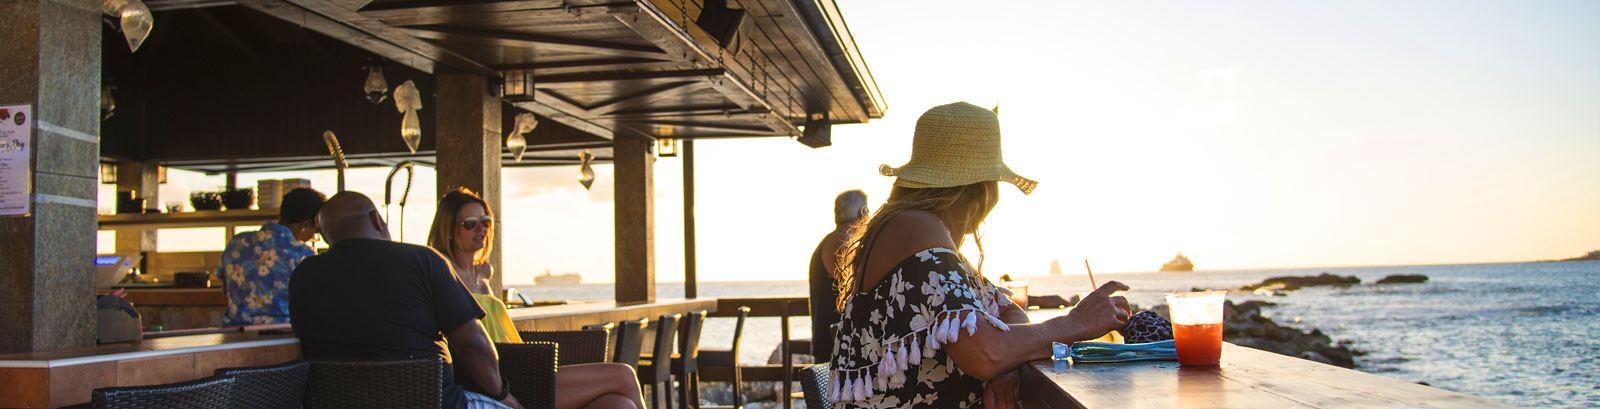 Coco Beach Bar - Nos recommandations à Simpson Bay Resort & Marina